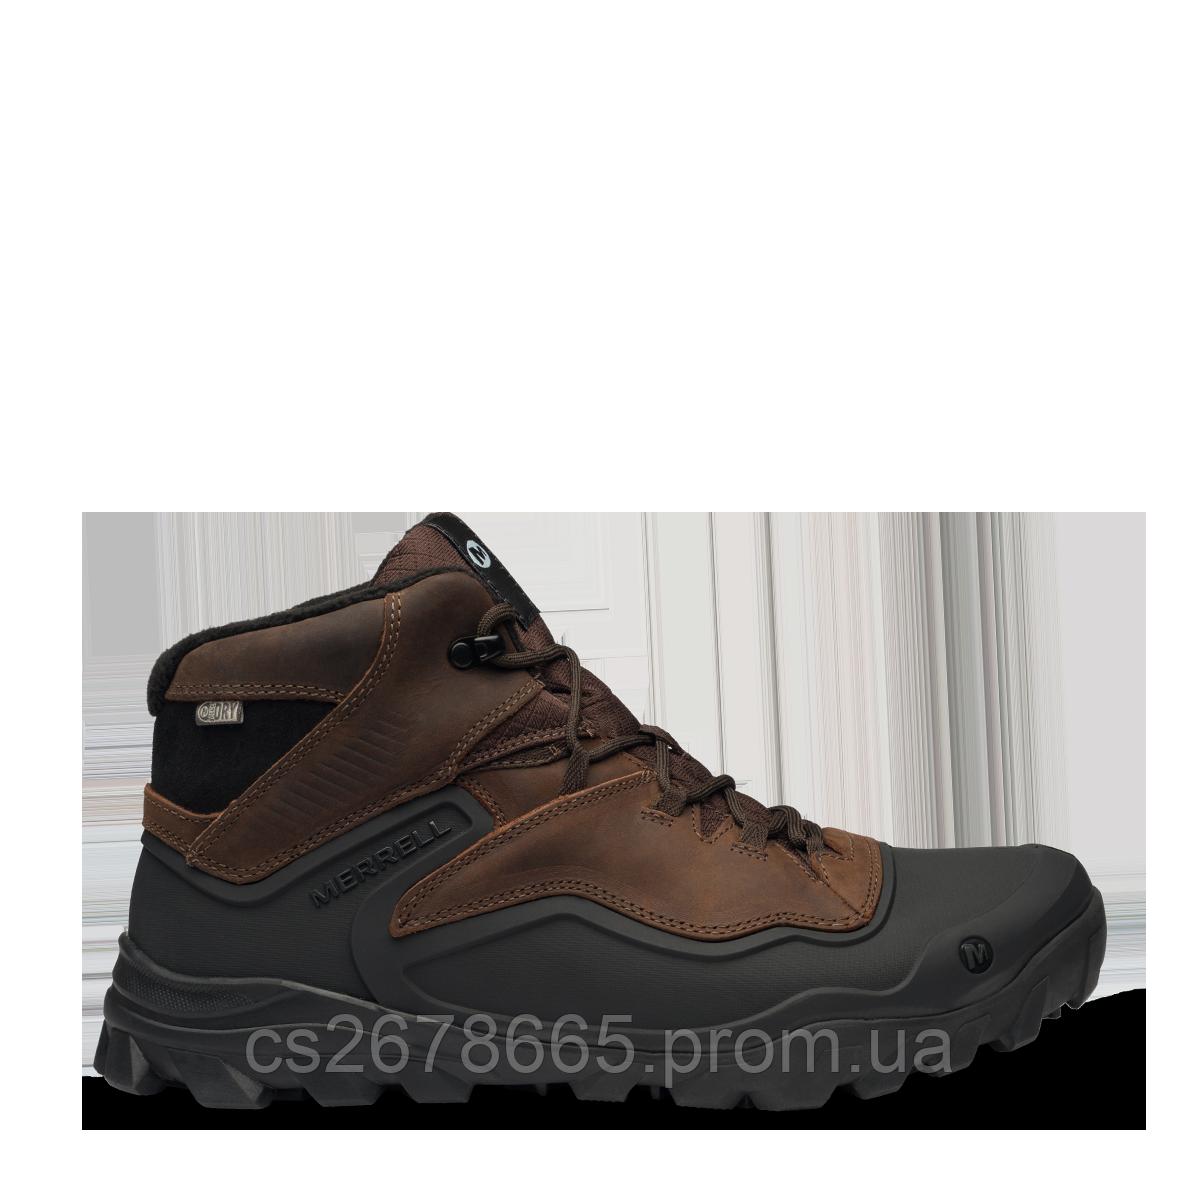 Ботинки Merrell Skyline Boulder 1203-409 Brown